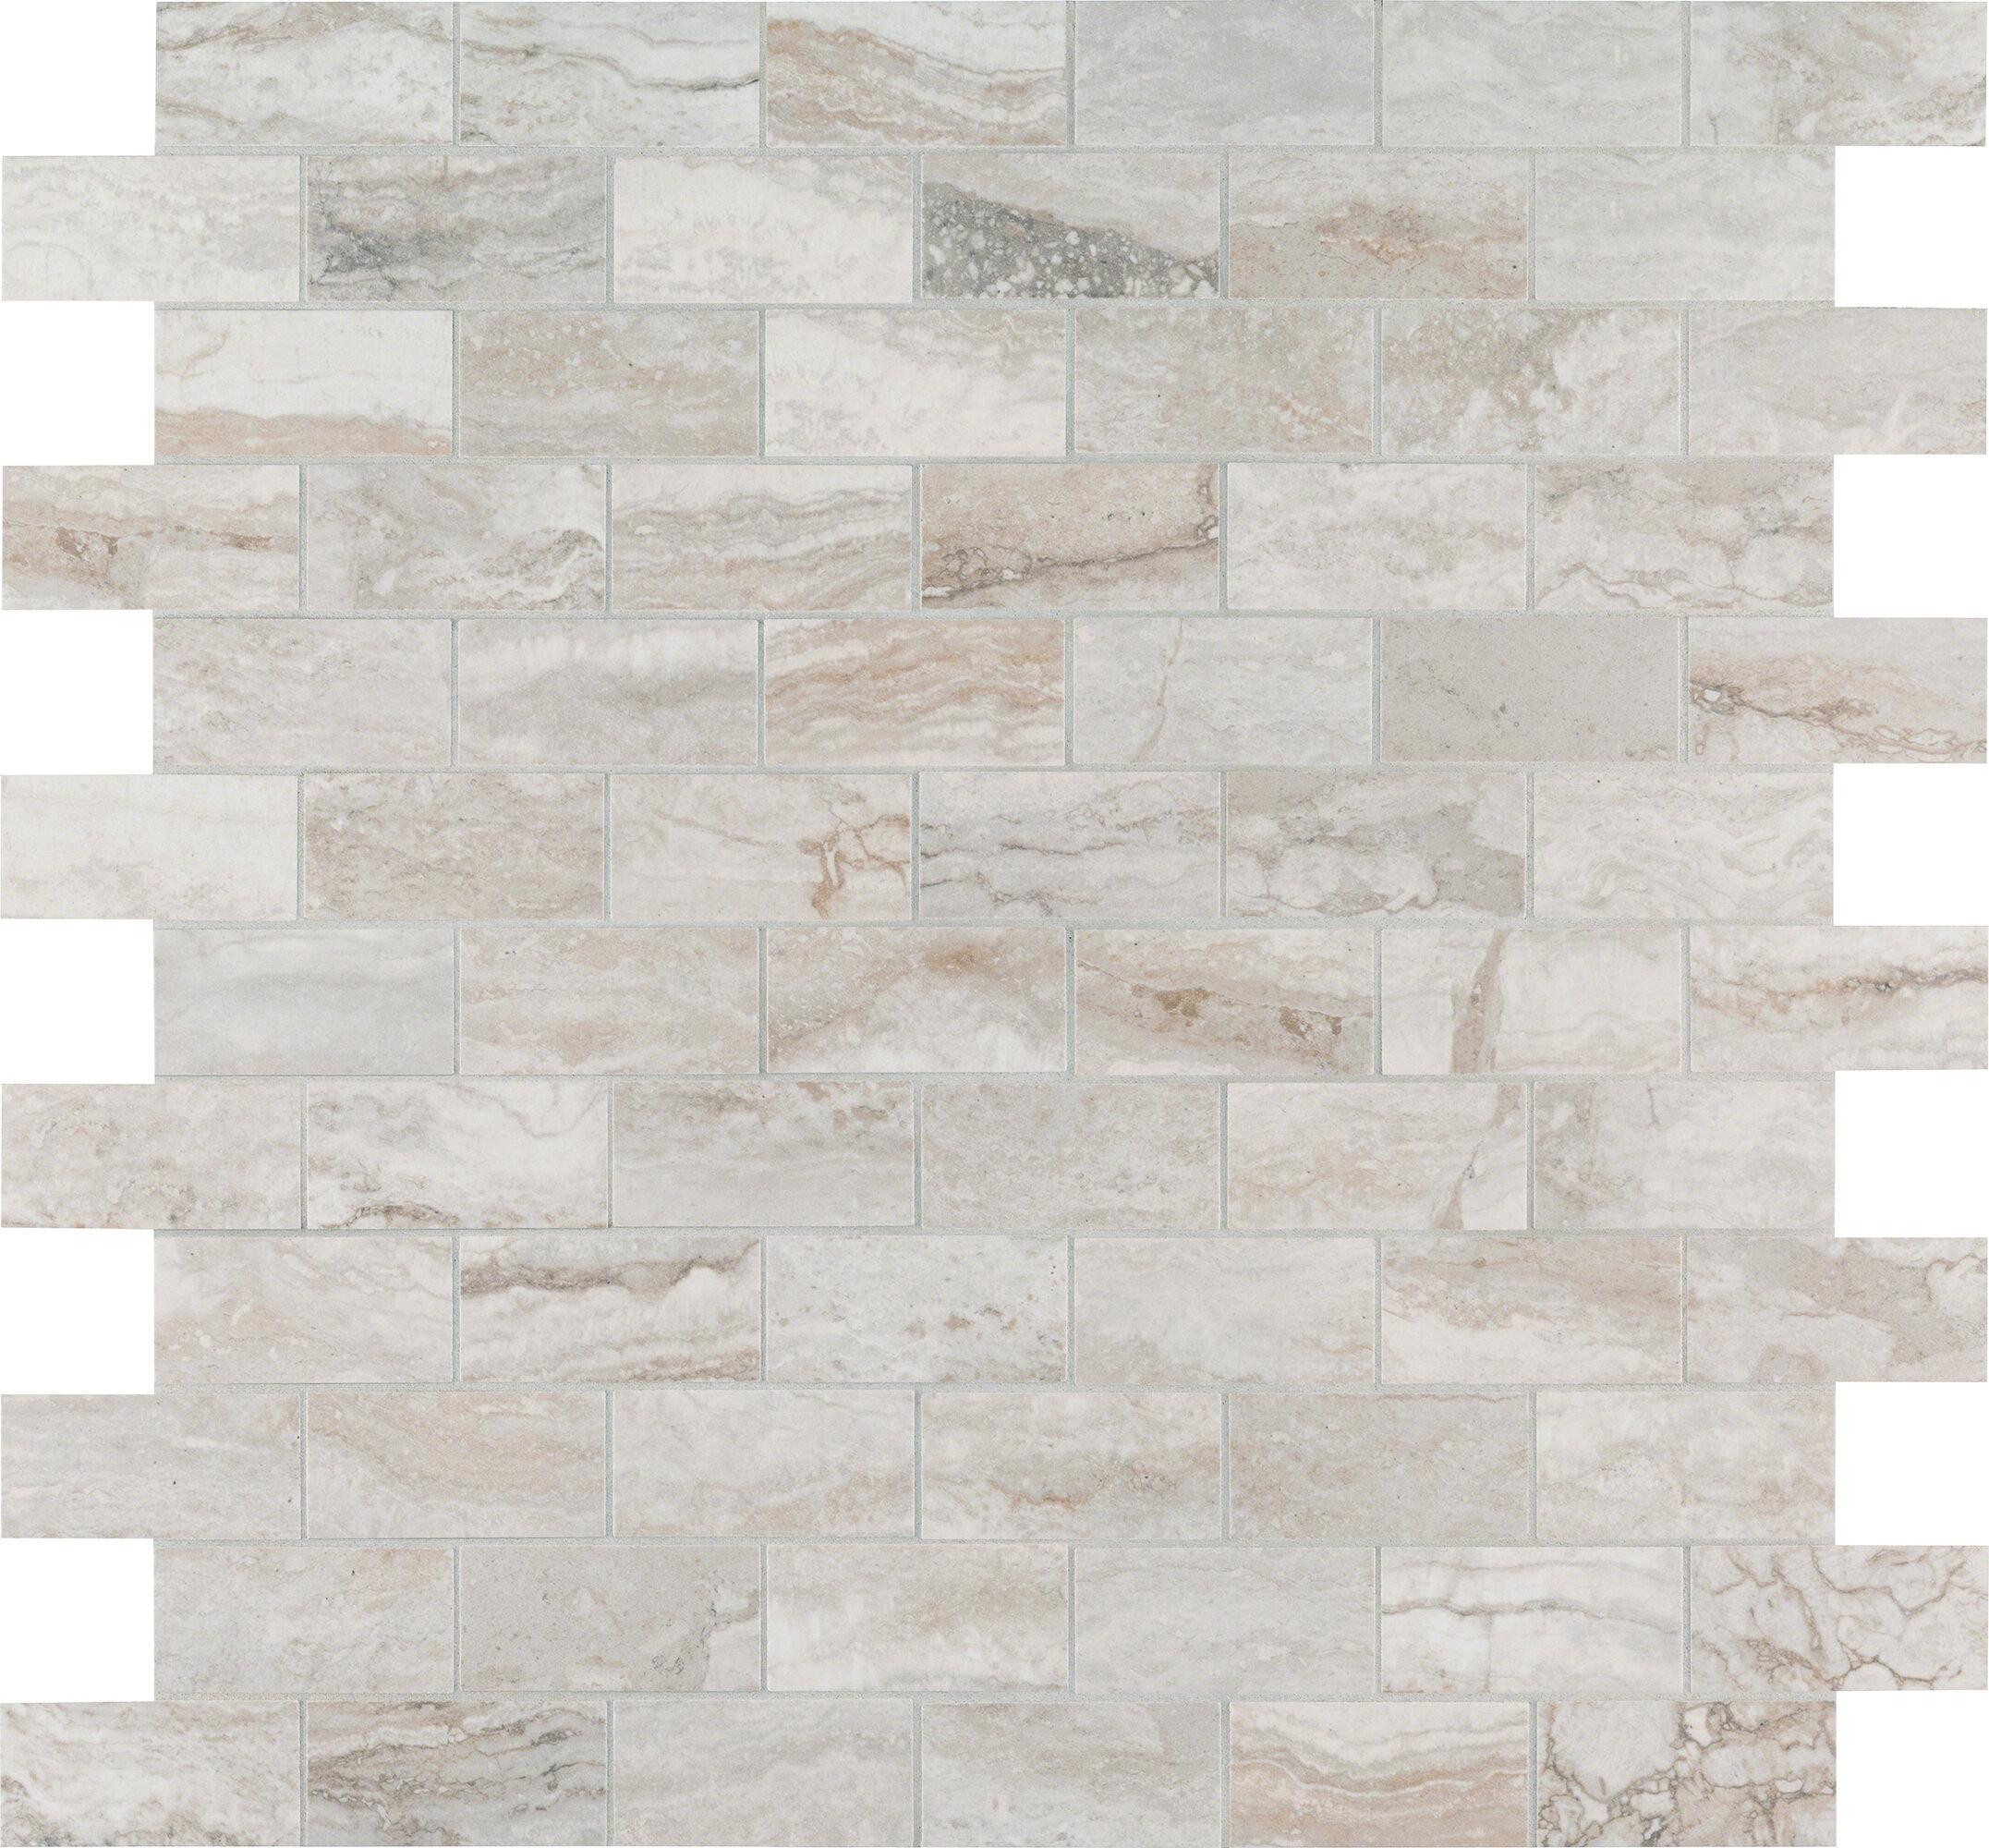 Brick Joint Mosaic Wall Floor Tile